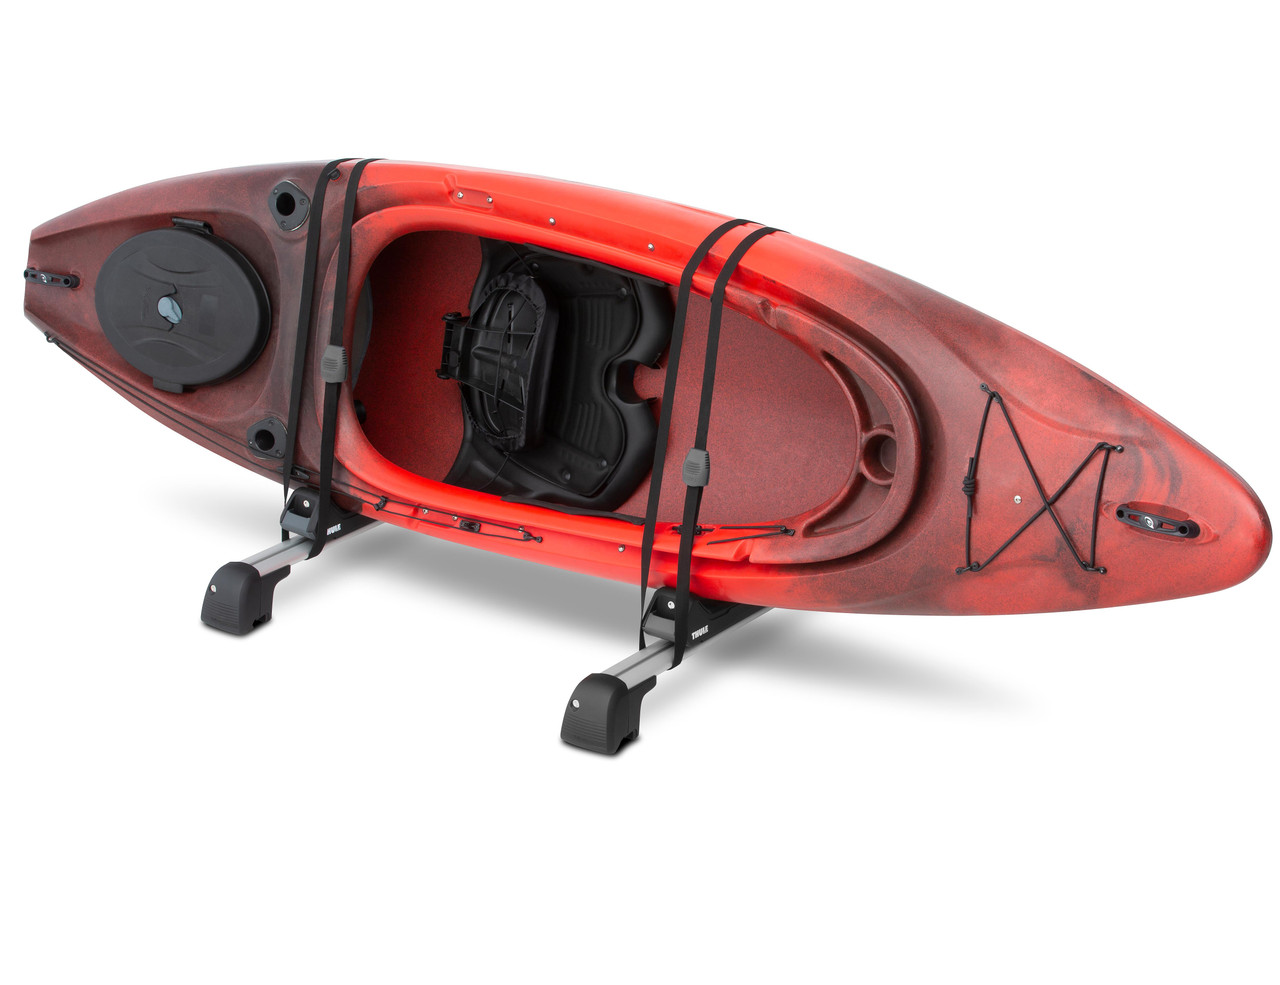 THULE Hulla-A-Port Aero Kayak Holder